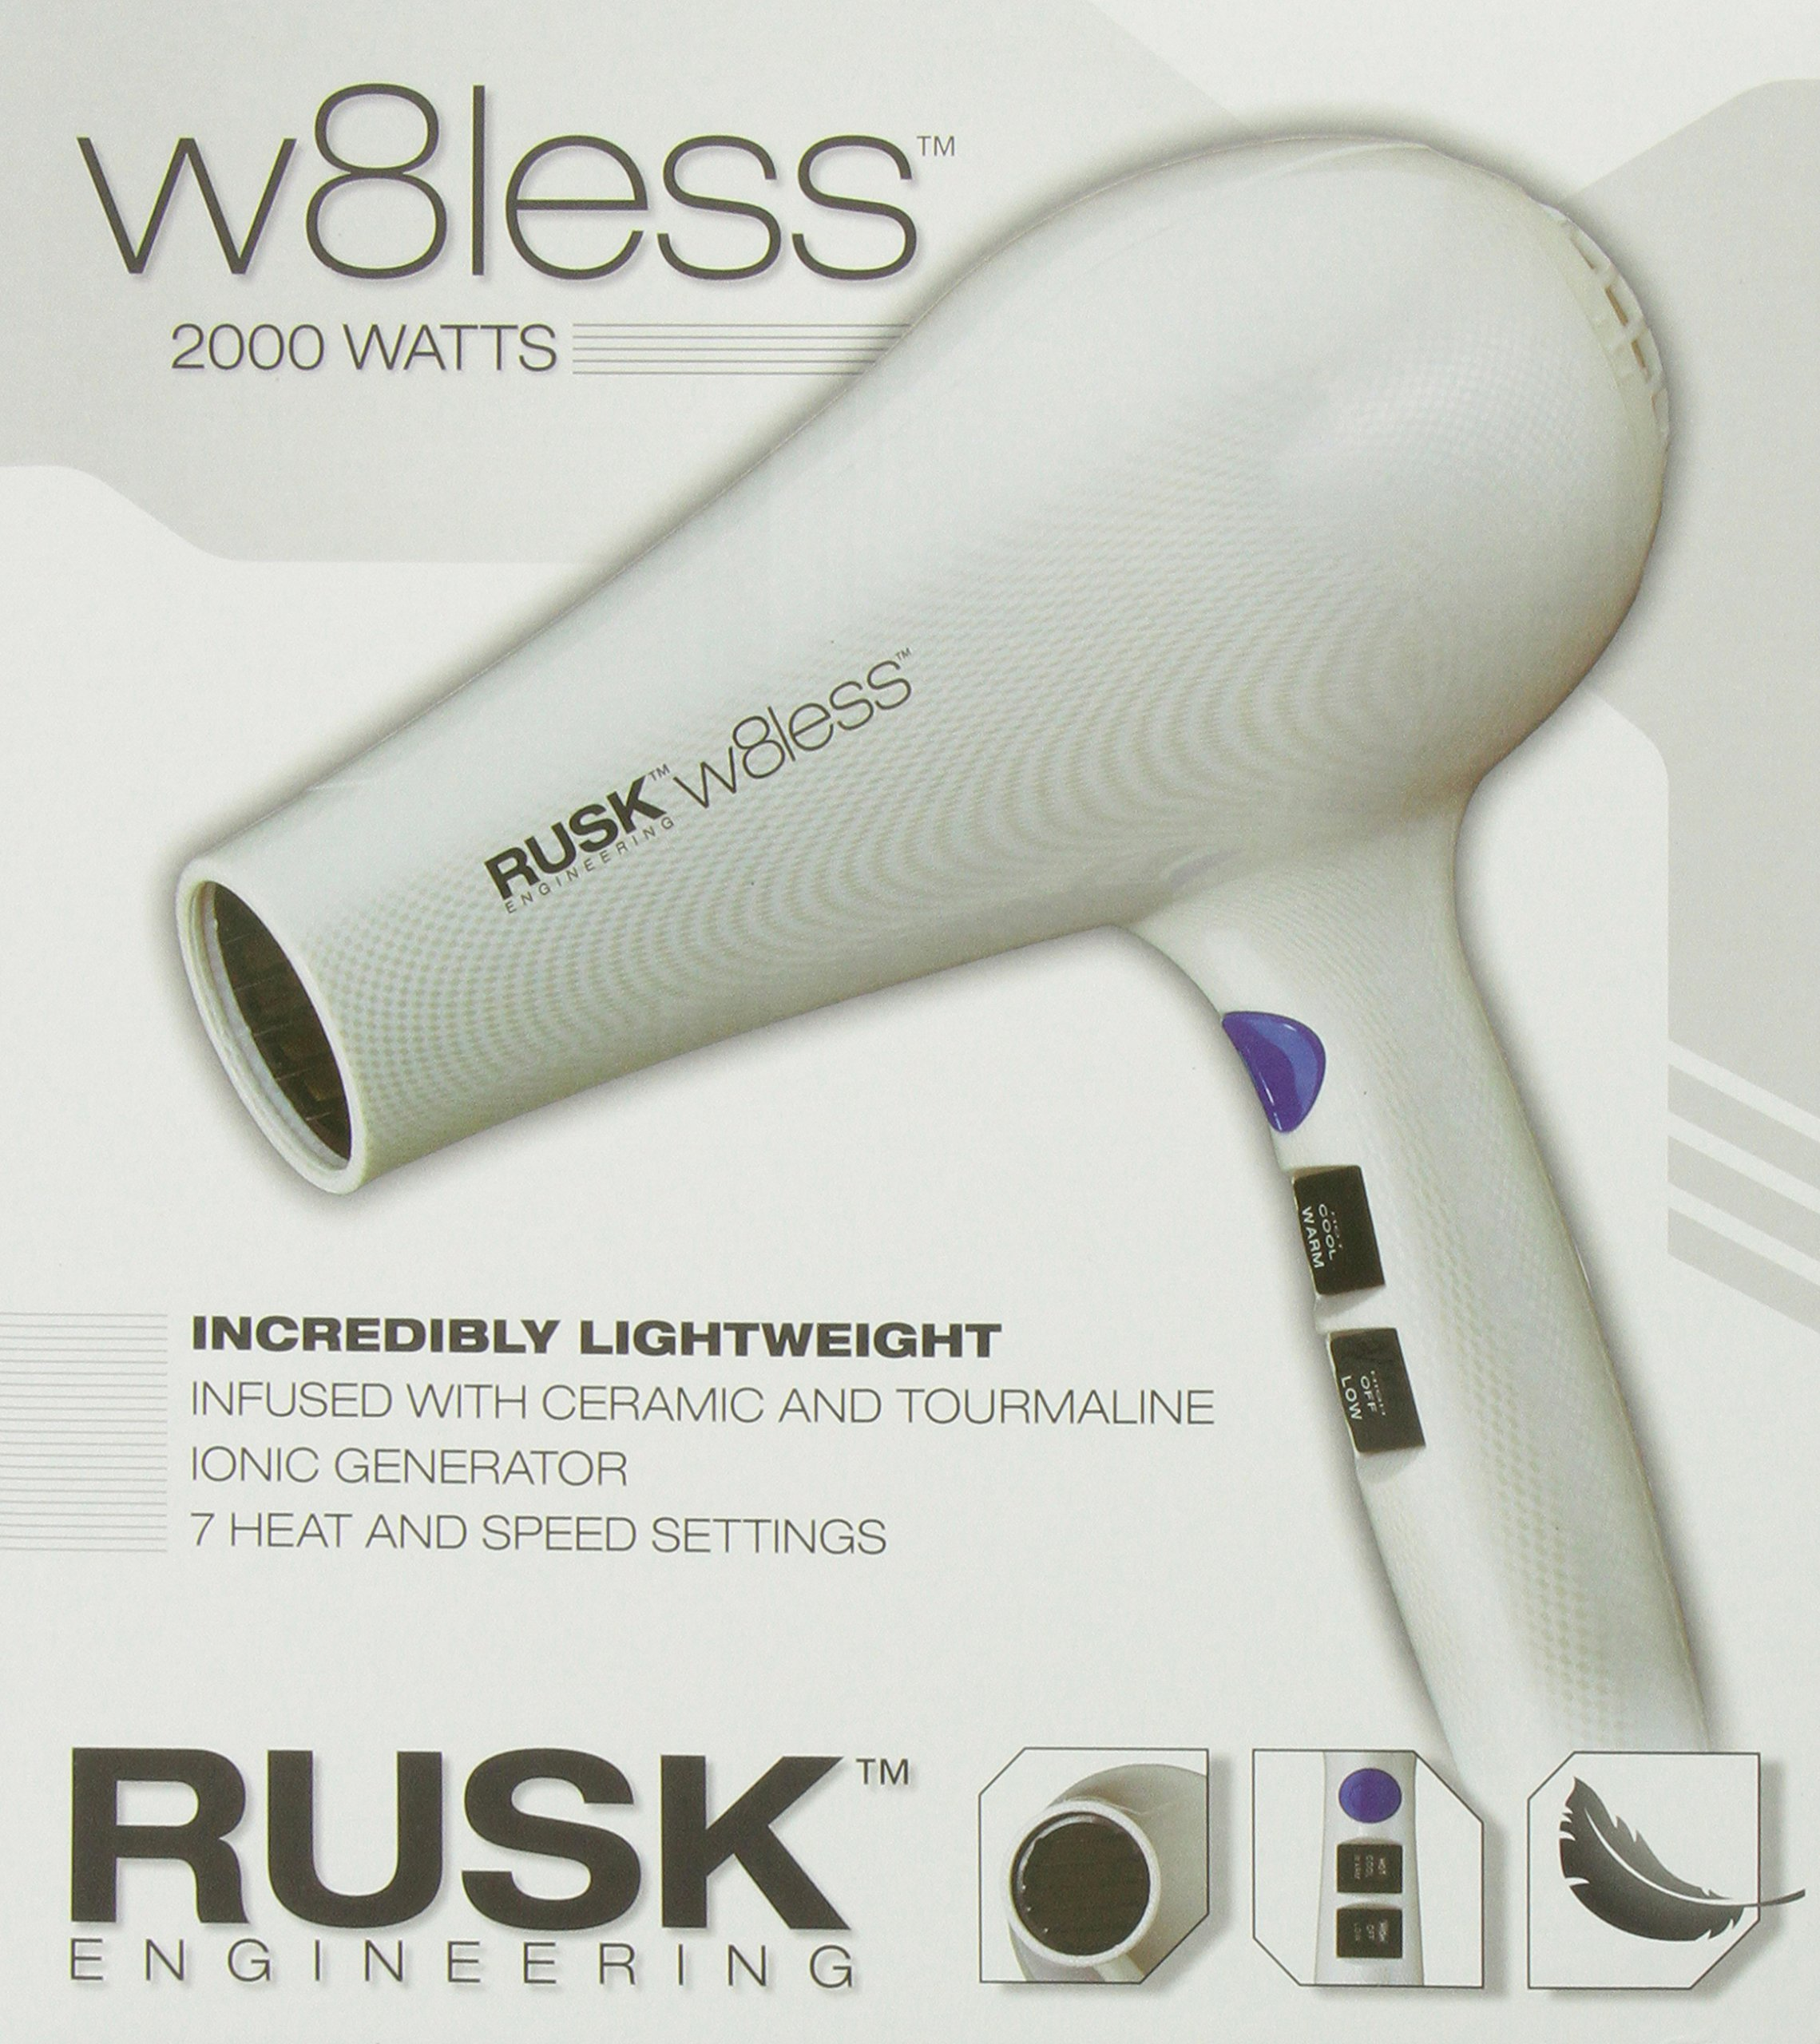 RUSK Engineering W8less Professional 2000 Watt Dryer by RUSK (Image #5)